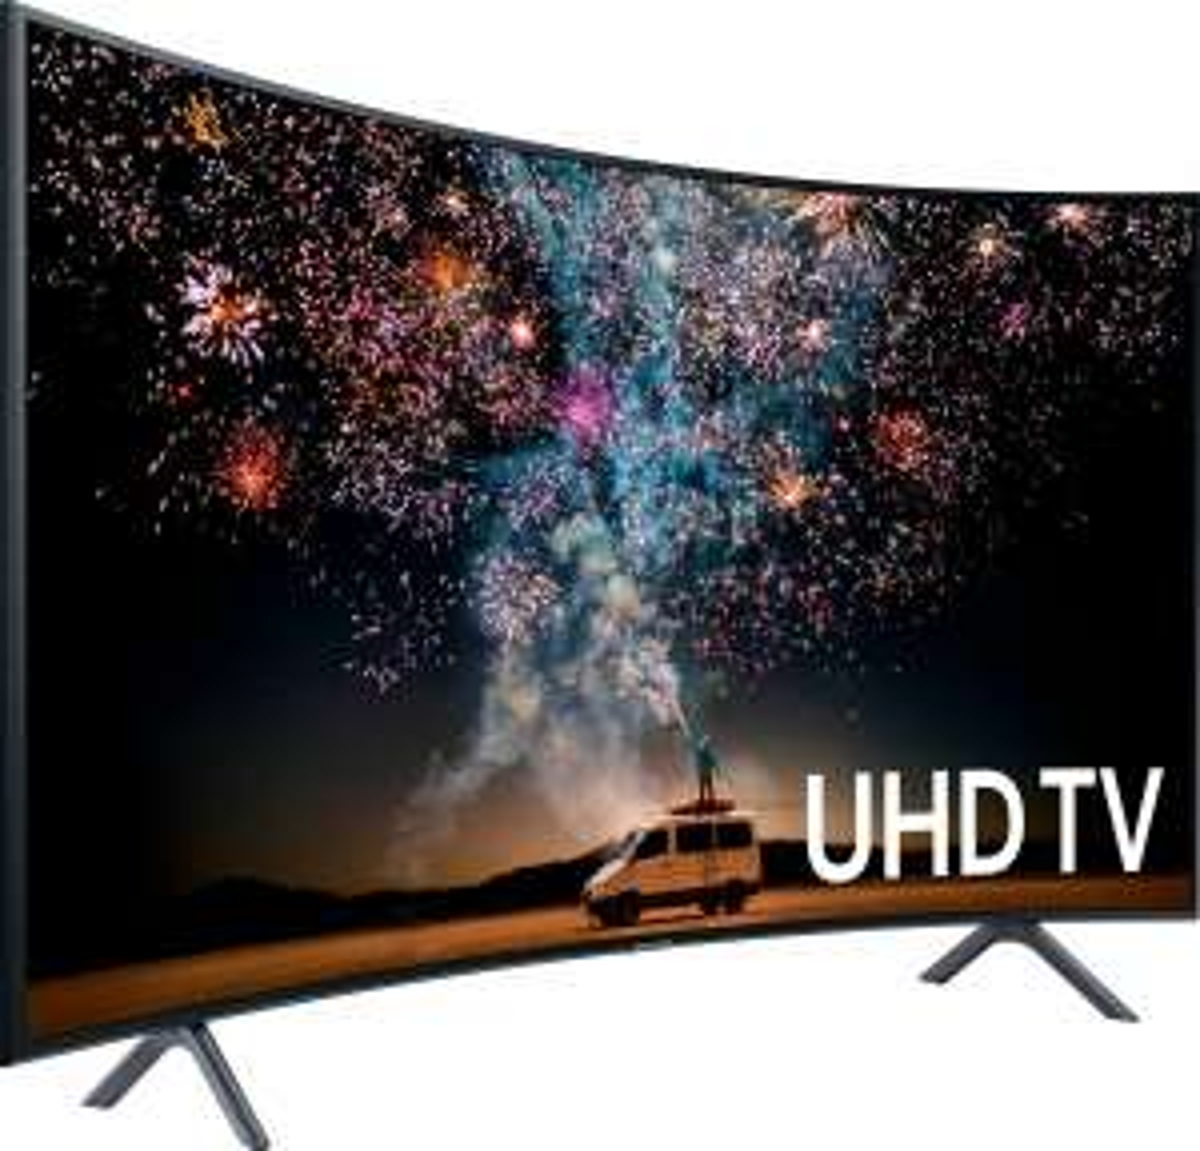 (Ohne Neukundengutschein!!) Samsung UE49RU7379, UE55RU7379, UE65RU7379 Curved-LED-Fernseher (49/55/66 Zoll, 4K Ultra HD)